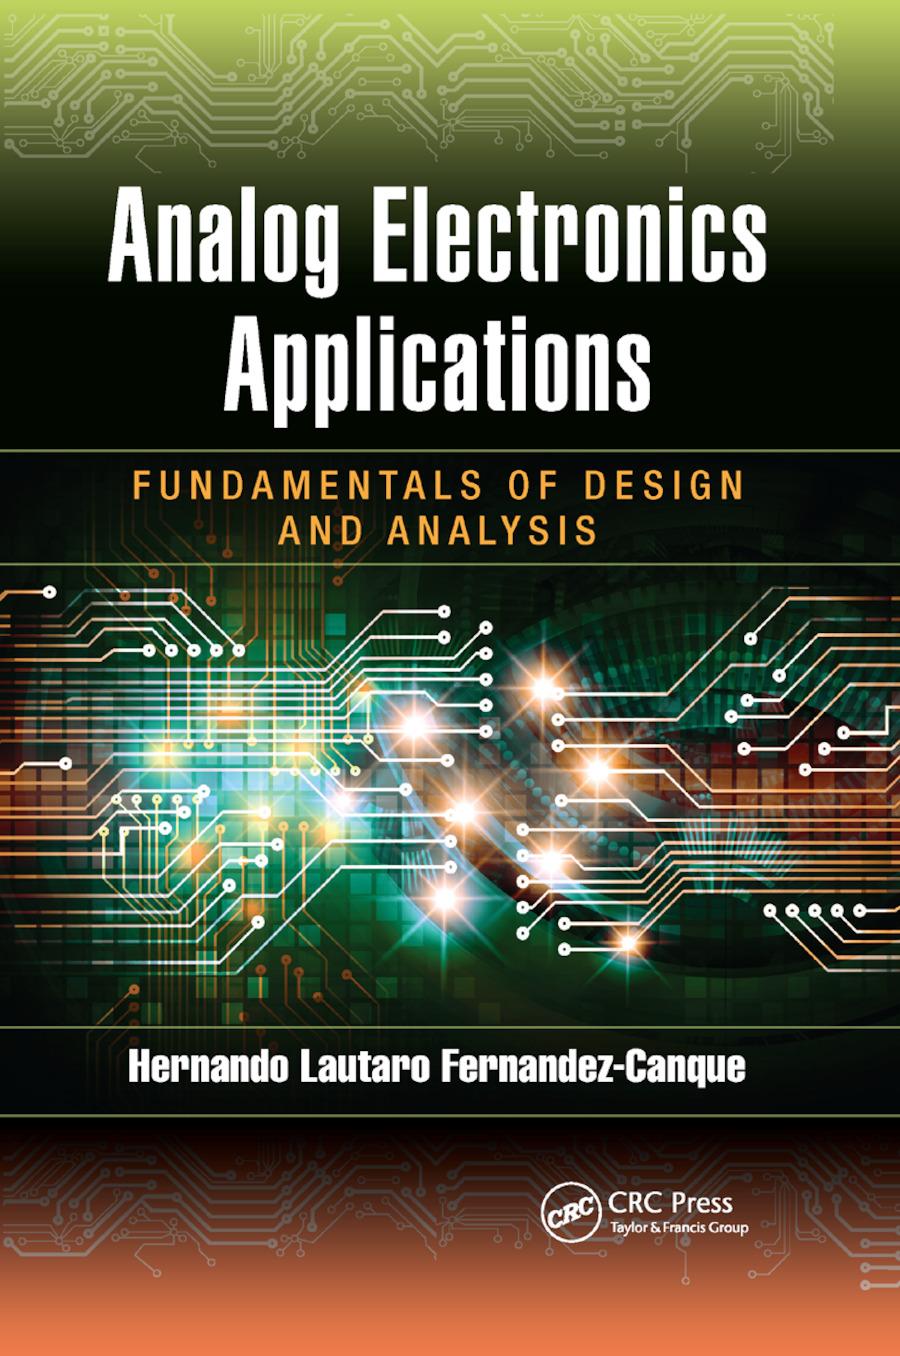 Analog Electronics Applications